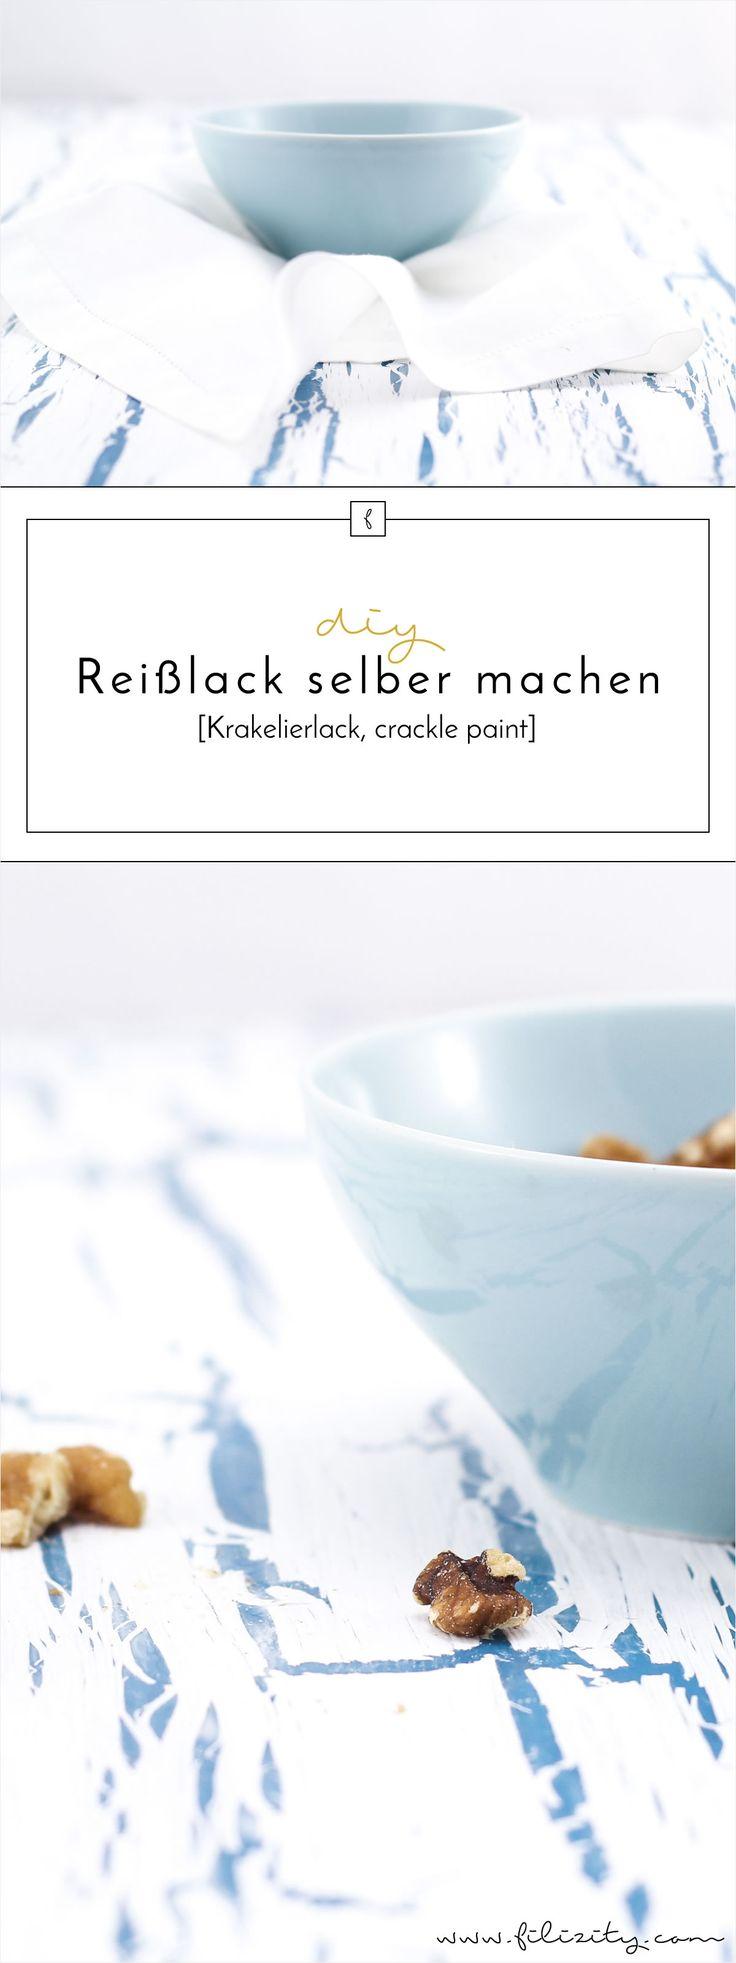 DIY Krakelierlack (crackle paint): Reißlack selber machen